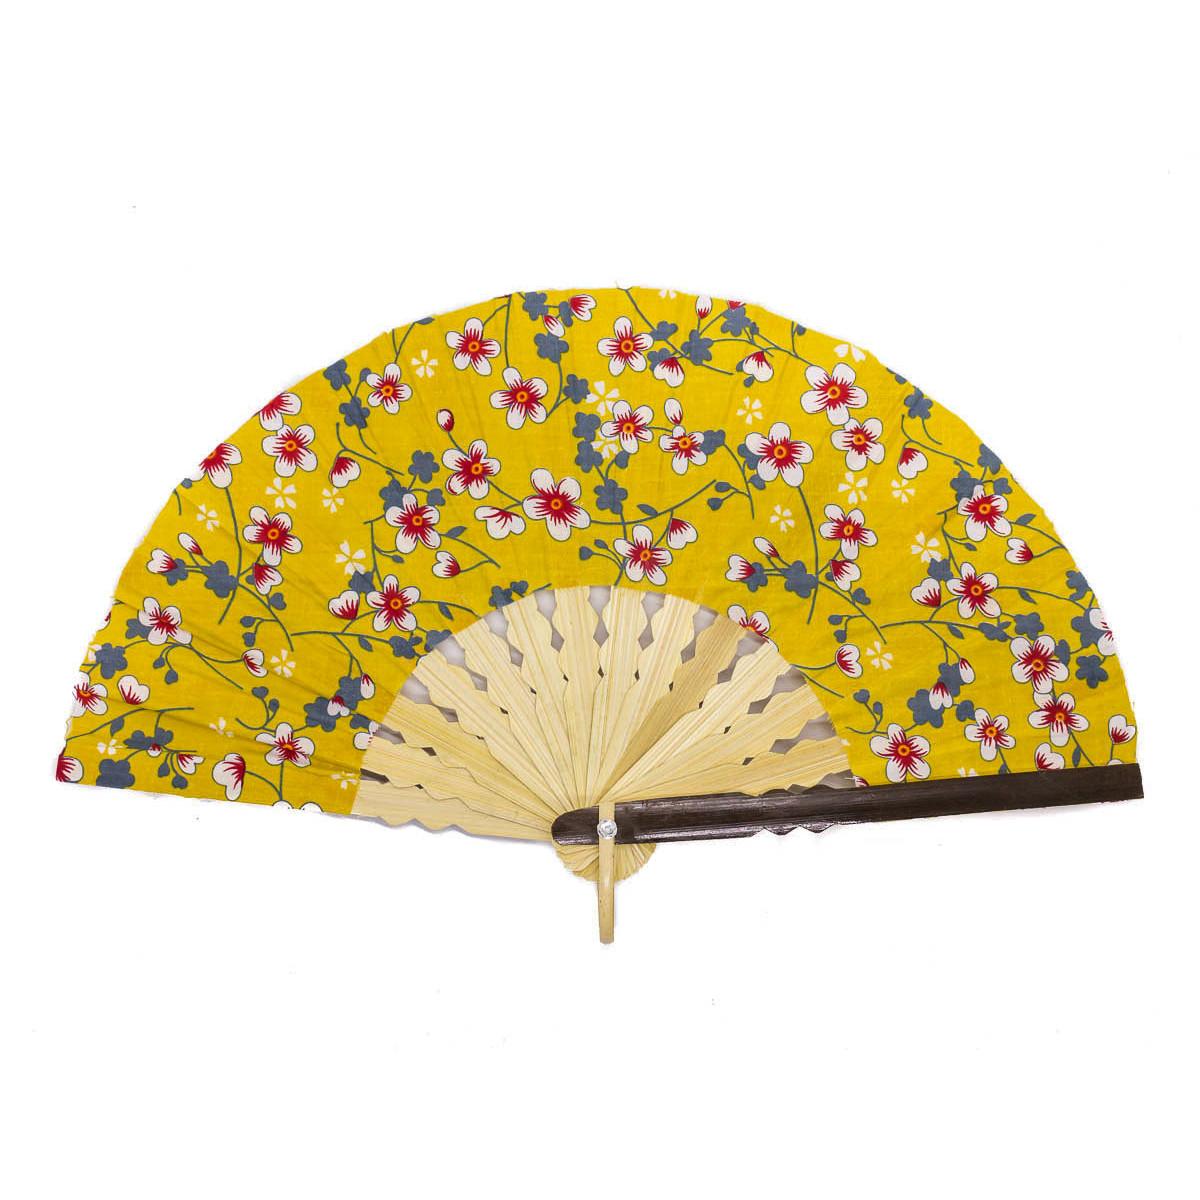 Eventail jaune moutarde et fleurs de cerisiers